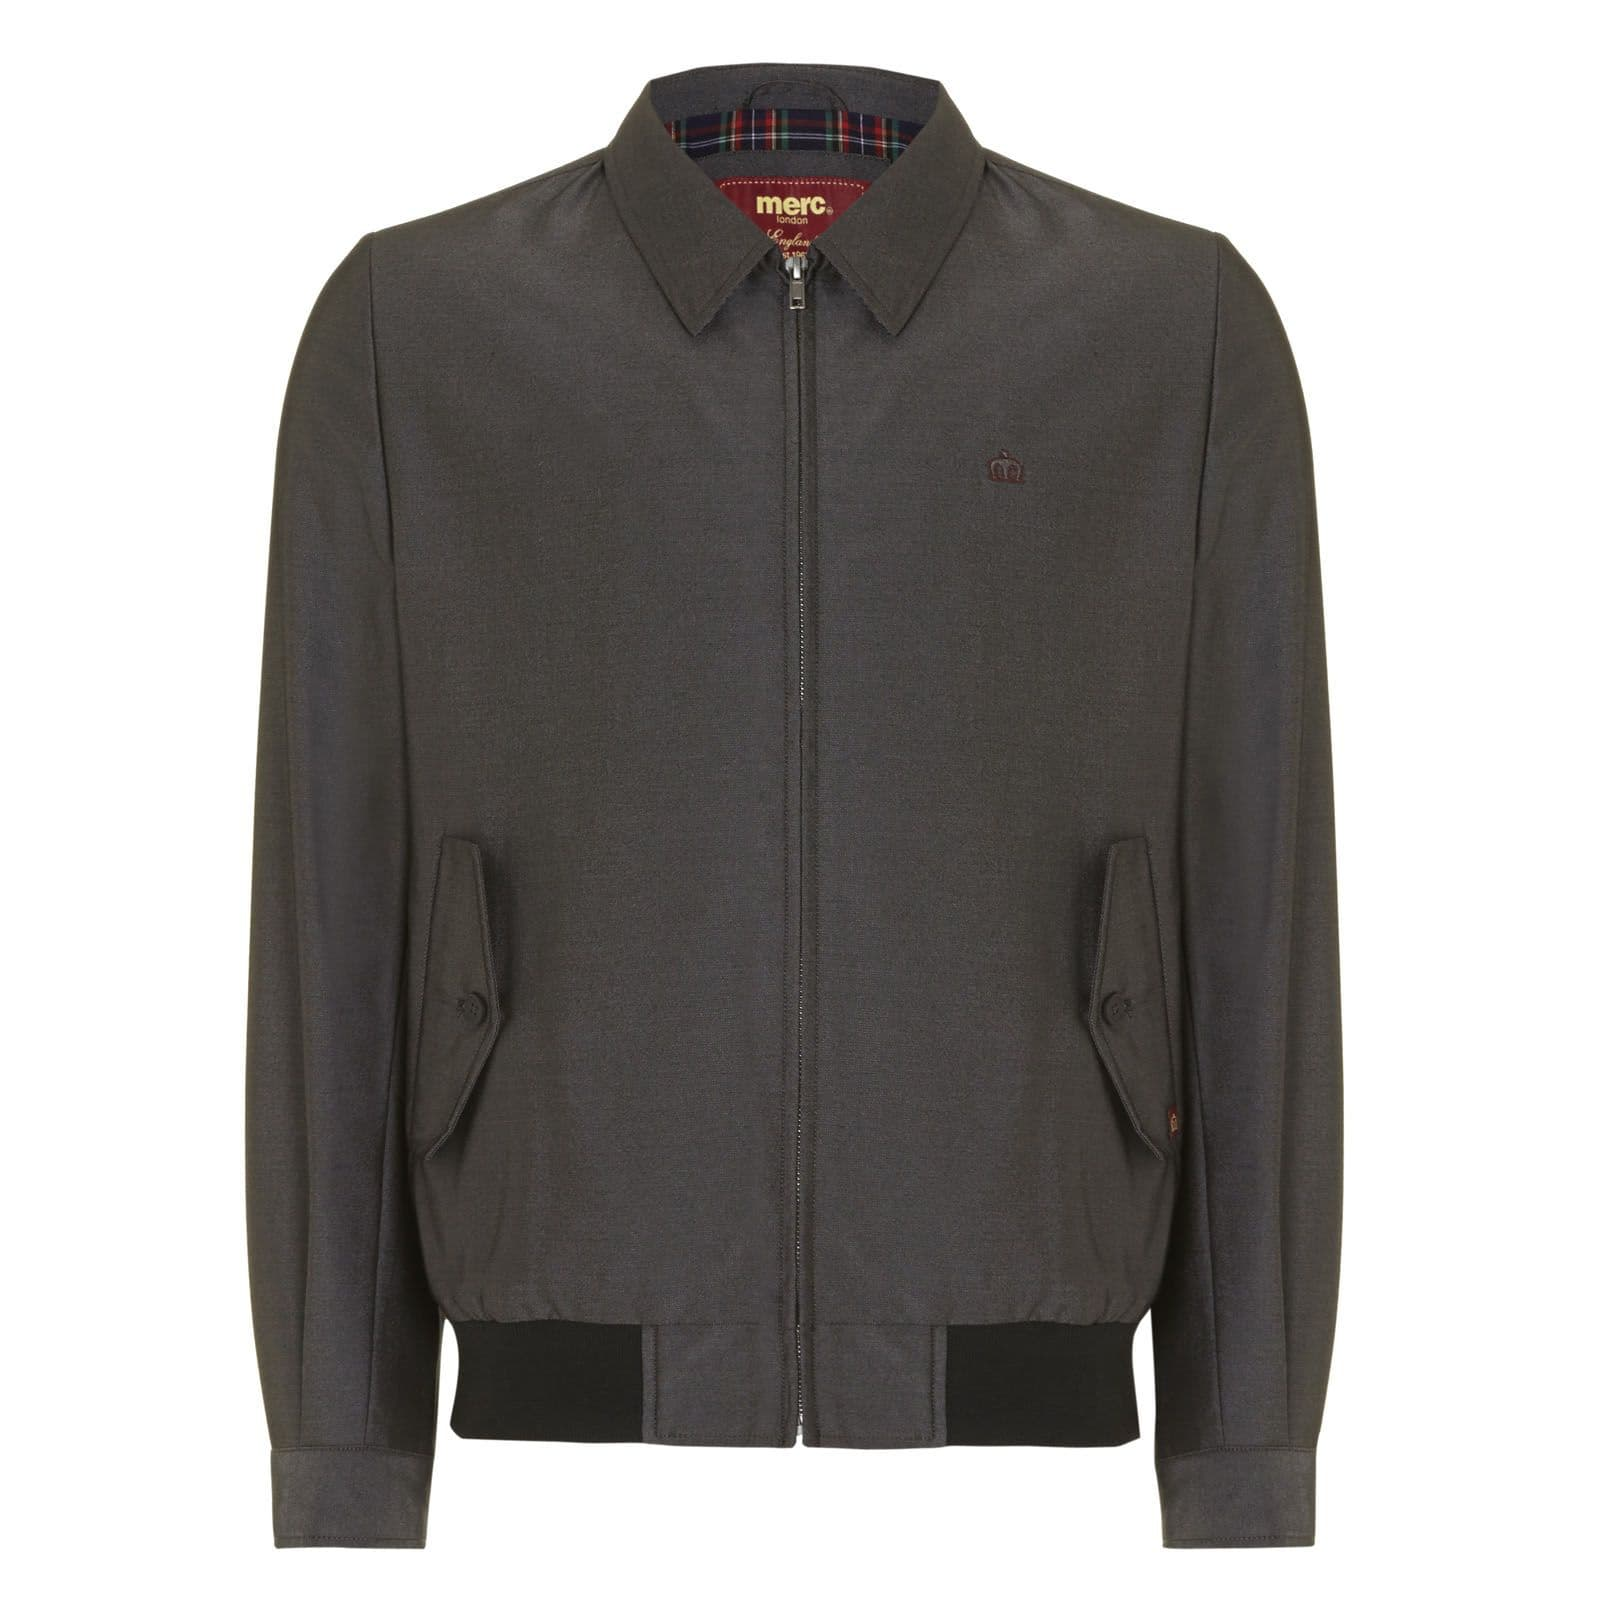 Куртка Харрингтон DudleyКуртки под заказ<br><br><br>Артикул: 1114204<br>Материал: 77% полиэстер, 23% район. Подкладка - 35% хлопок, 65% полиэстер<br>Цвет: темно-серый<br>Пол: Мужской